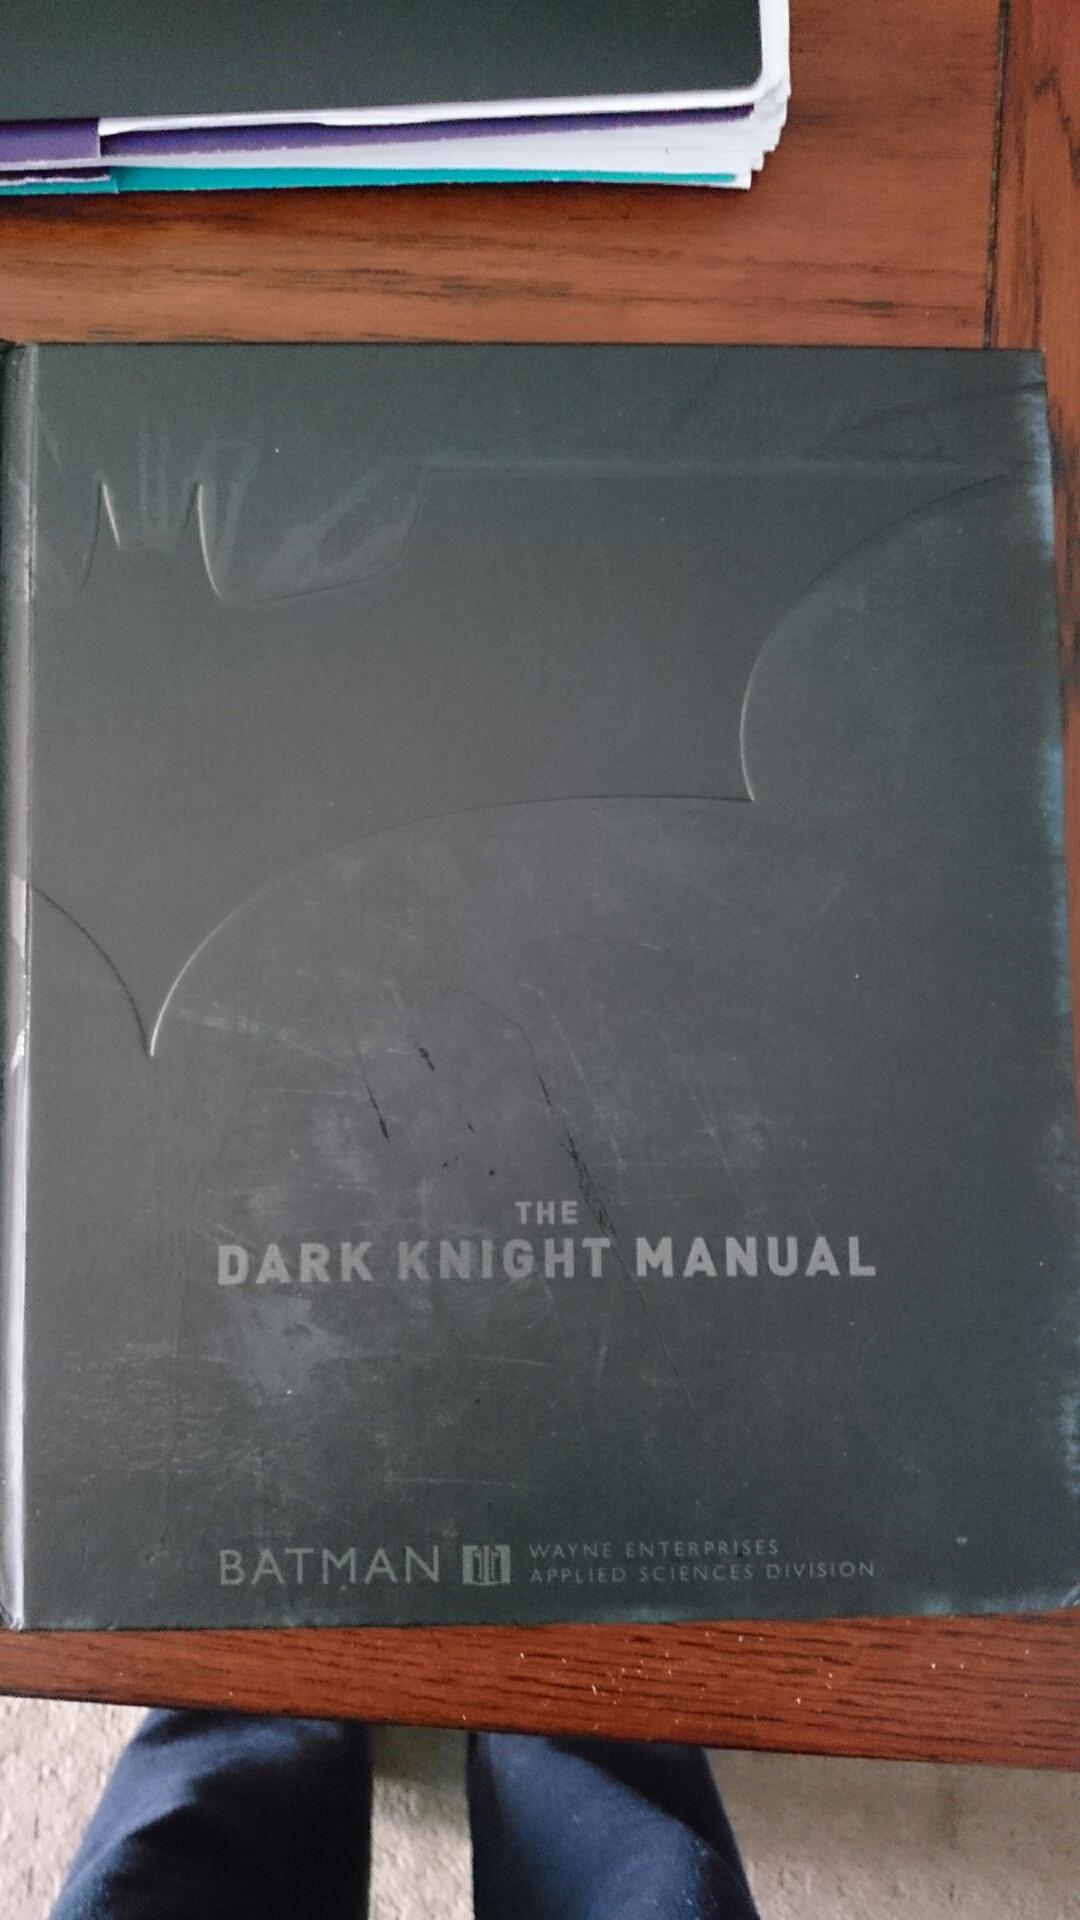 rant my theory on the joker u2019s identity in the dark knight dark knight analysis ipega dark knight manual